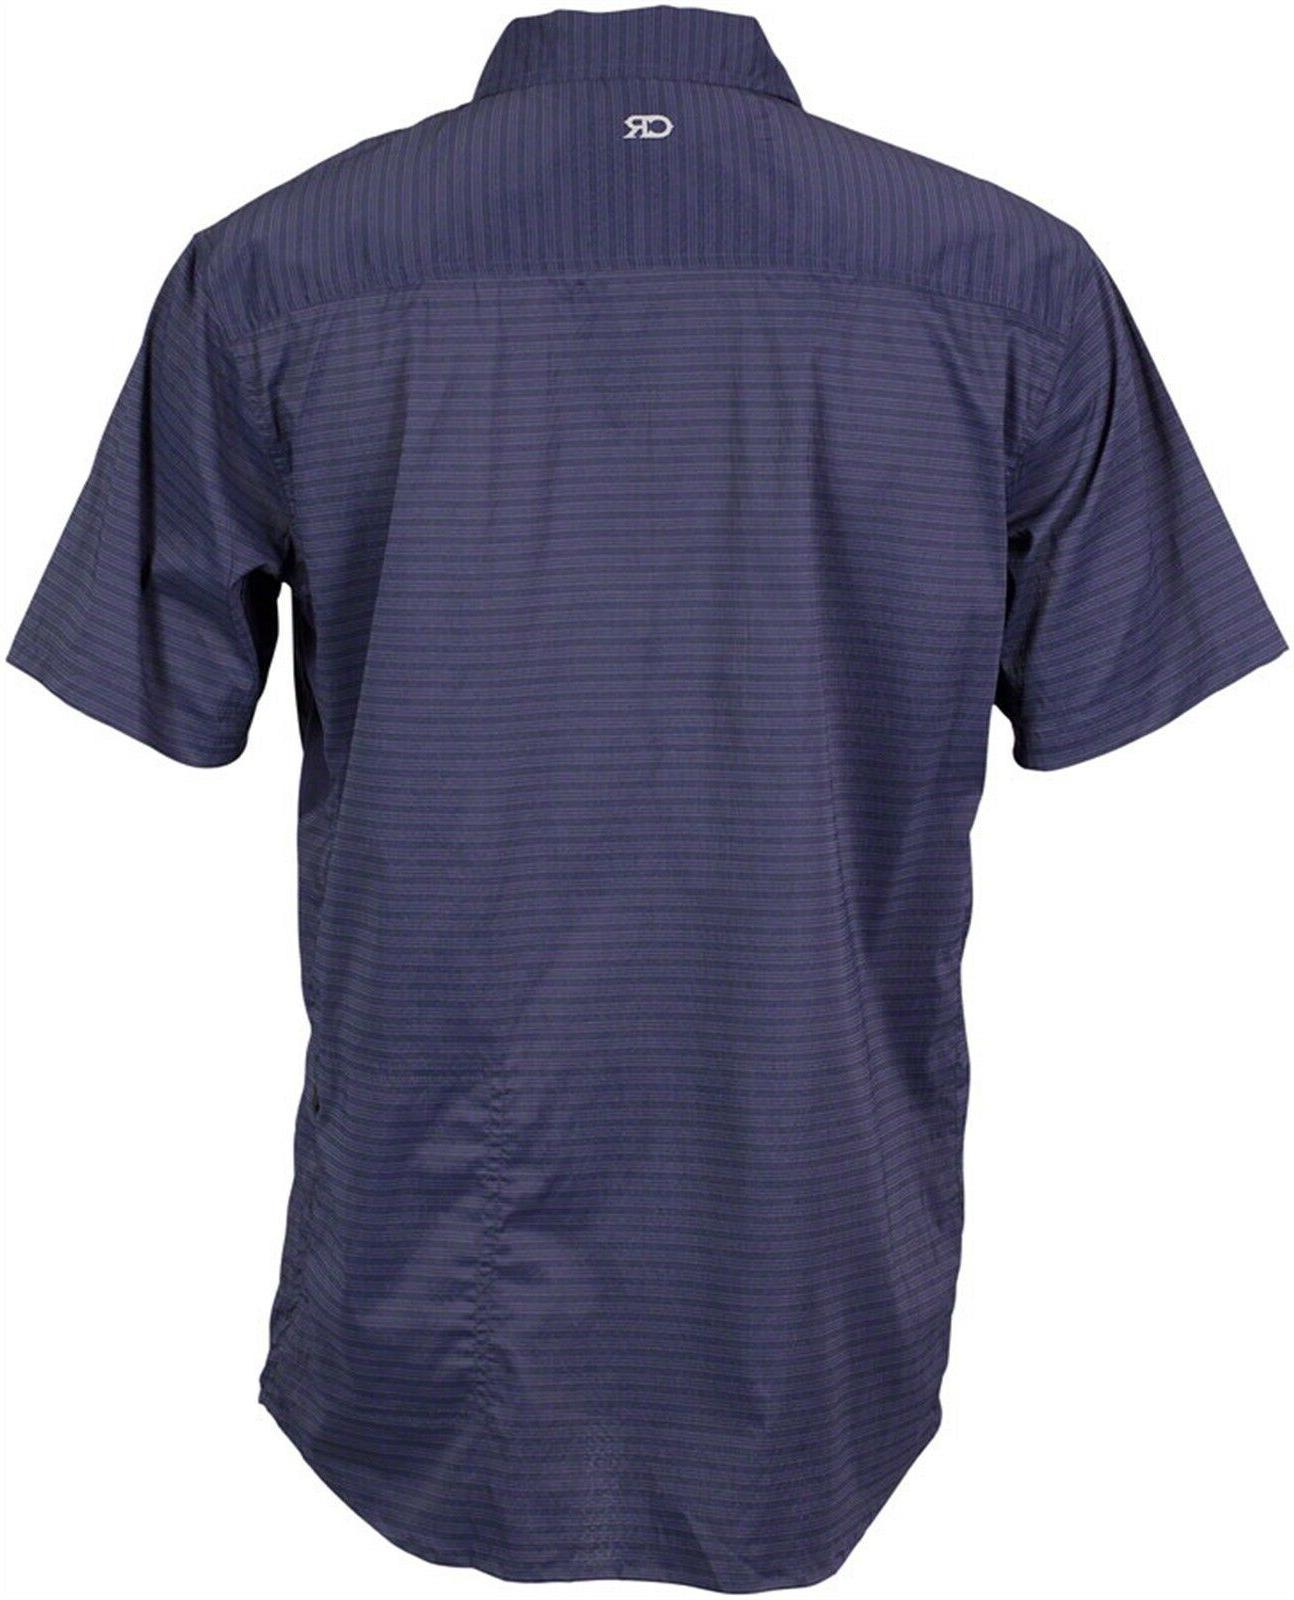 Club Ride Men's Short Shirt: MD